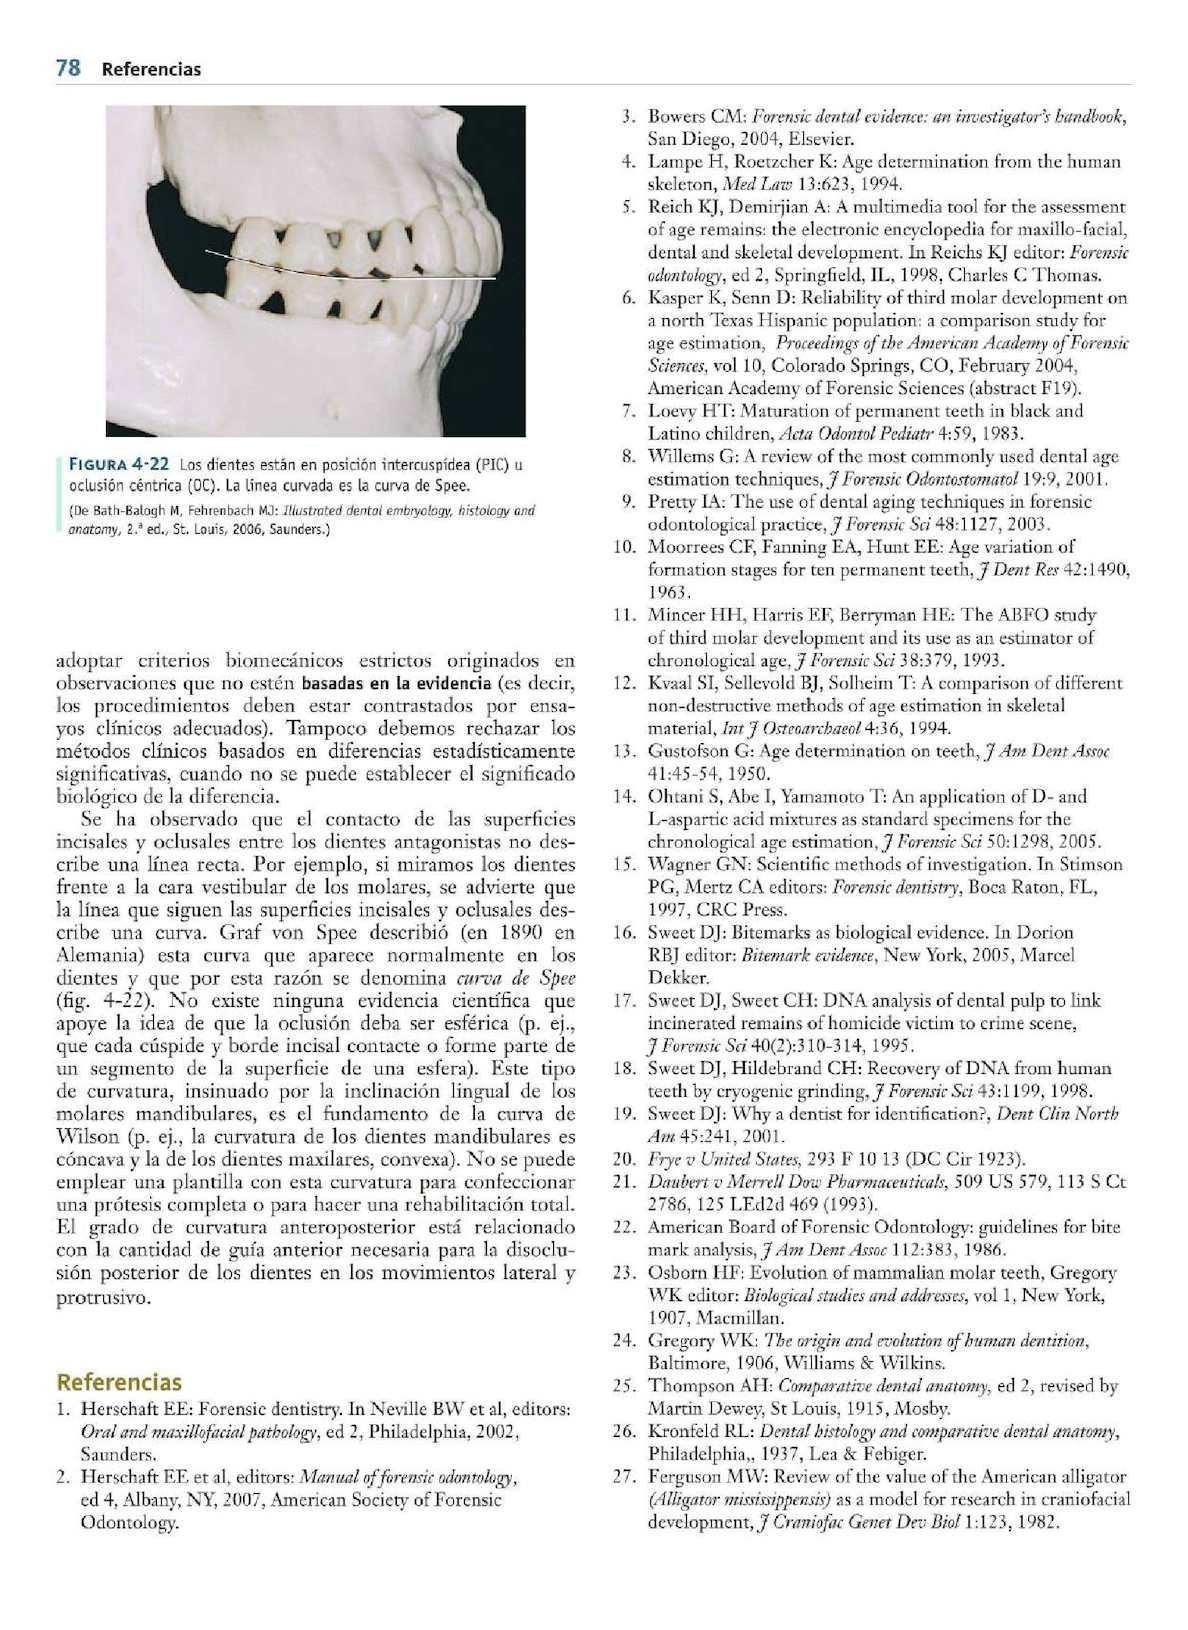 Anatomia Fisiologia Y Oclusion Dental - CALAMEO Downloader